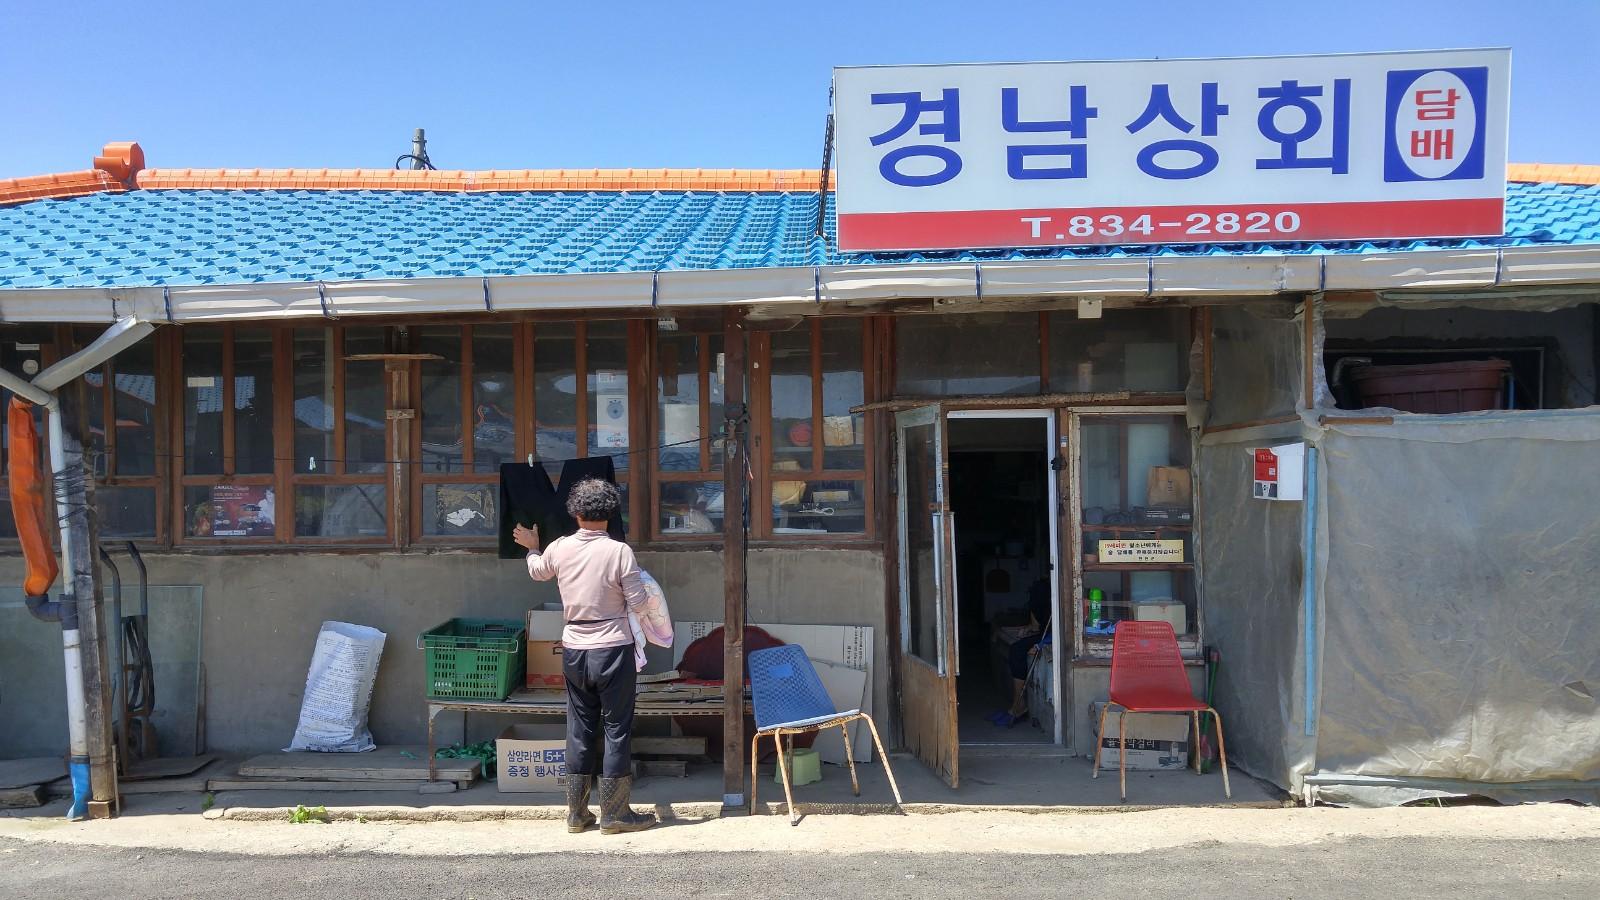 Tired of conflict  Life near the Korean DMZ - CNN d5d768200